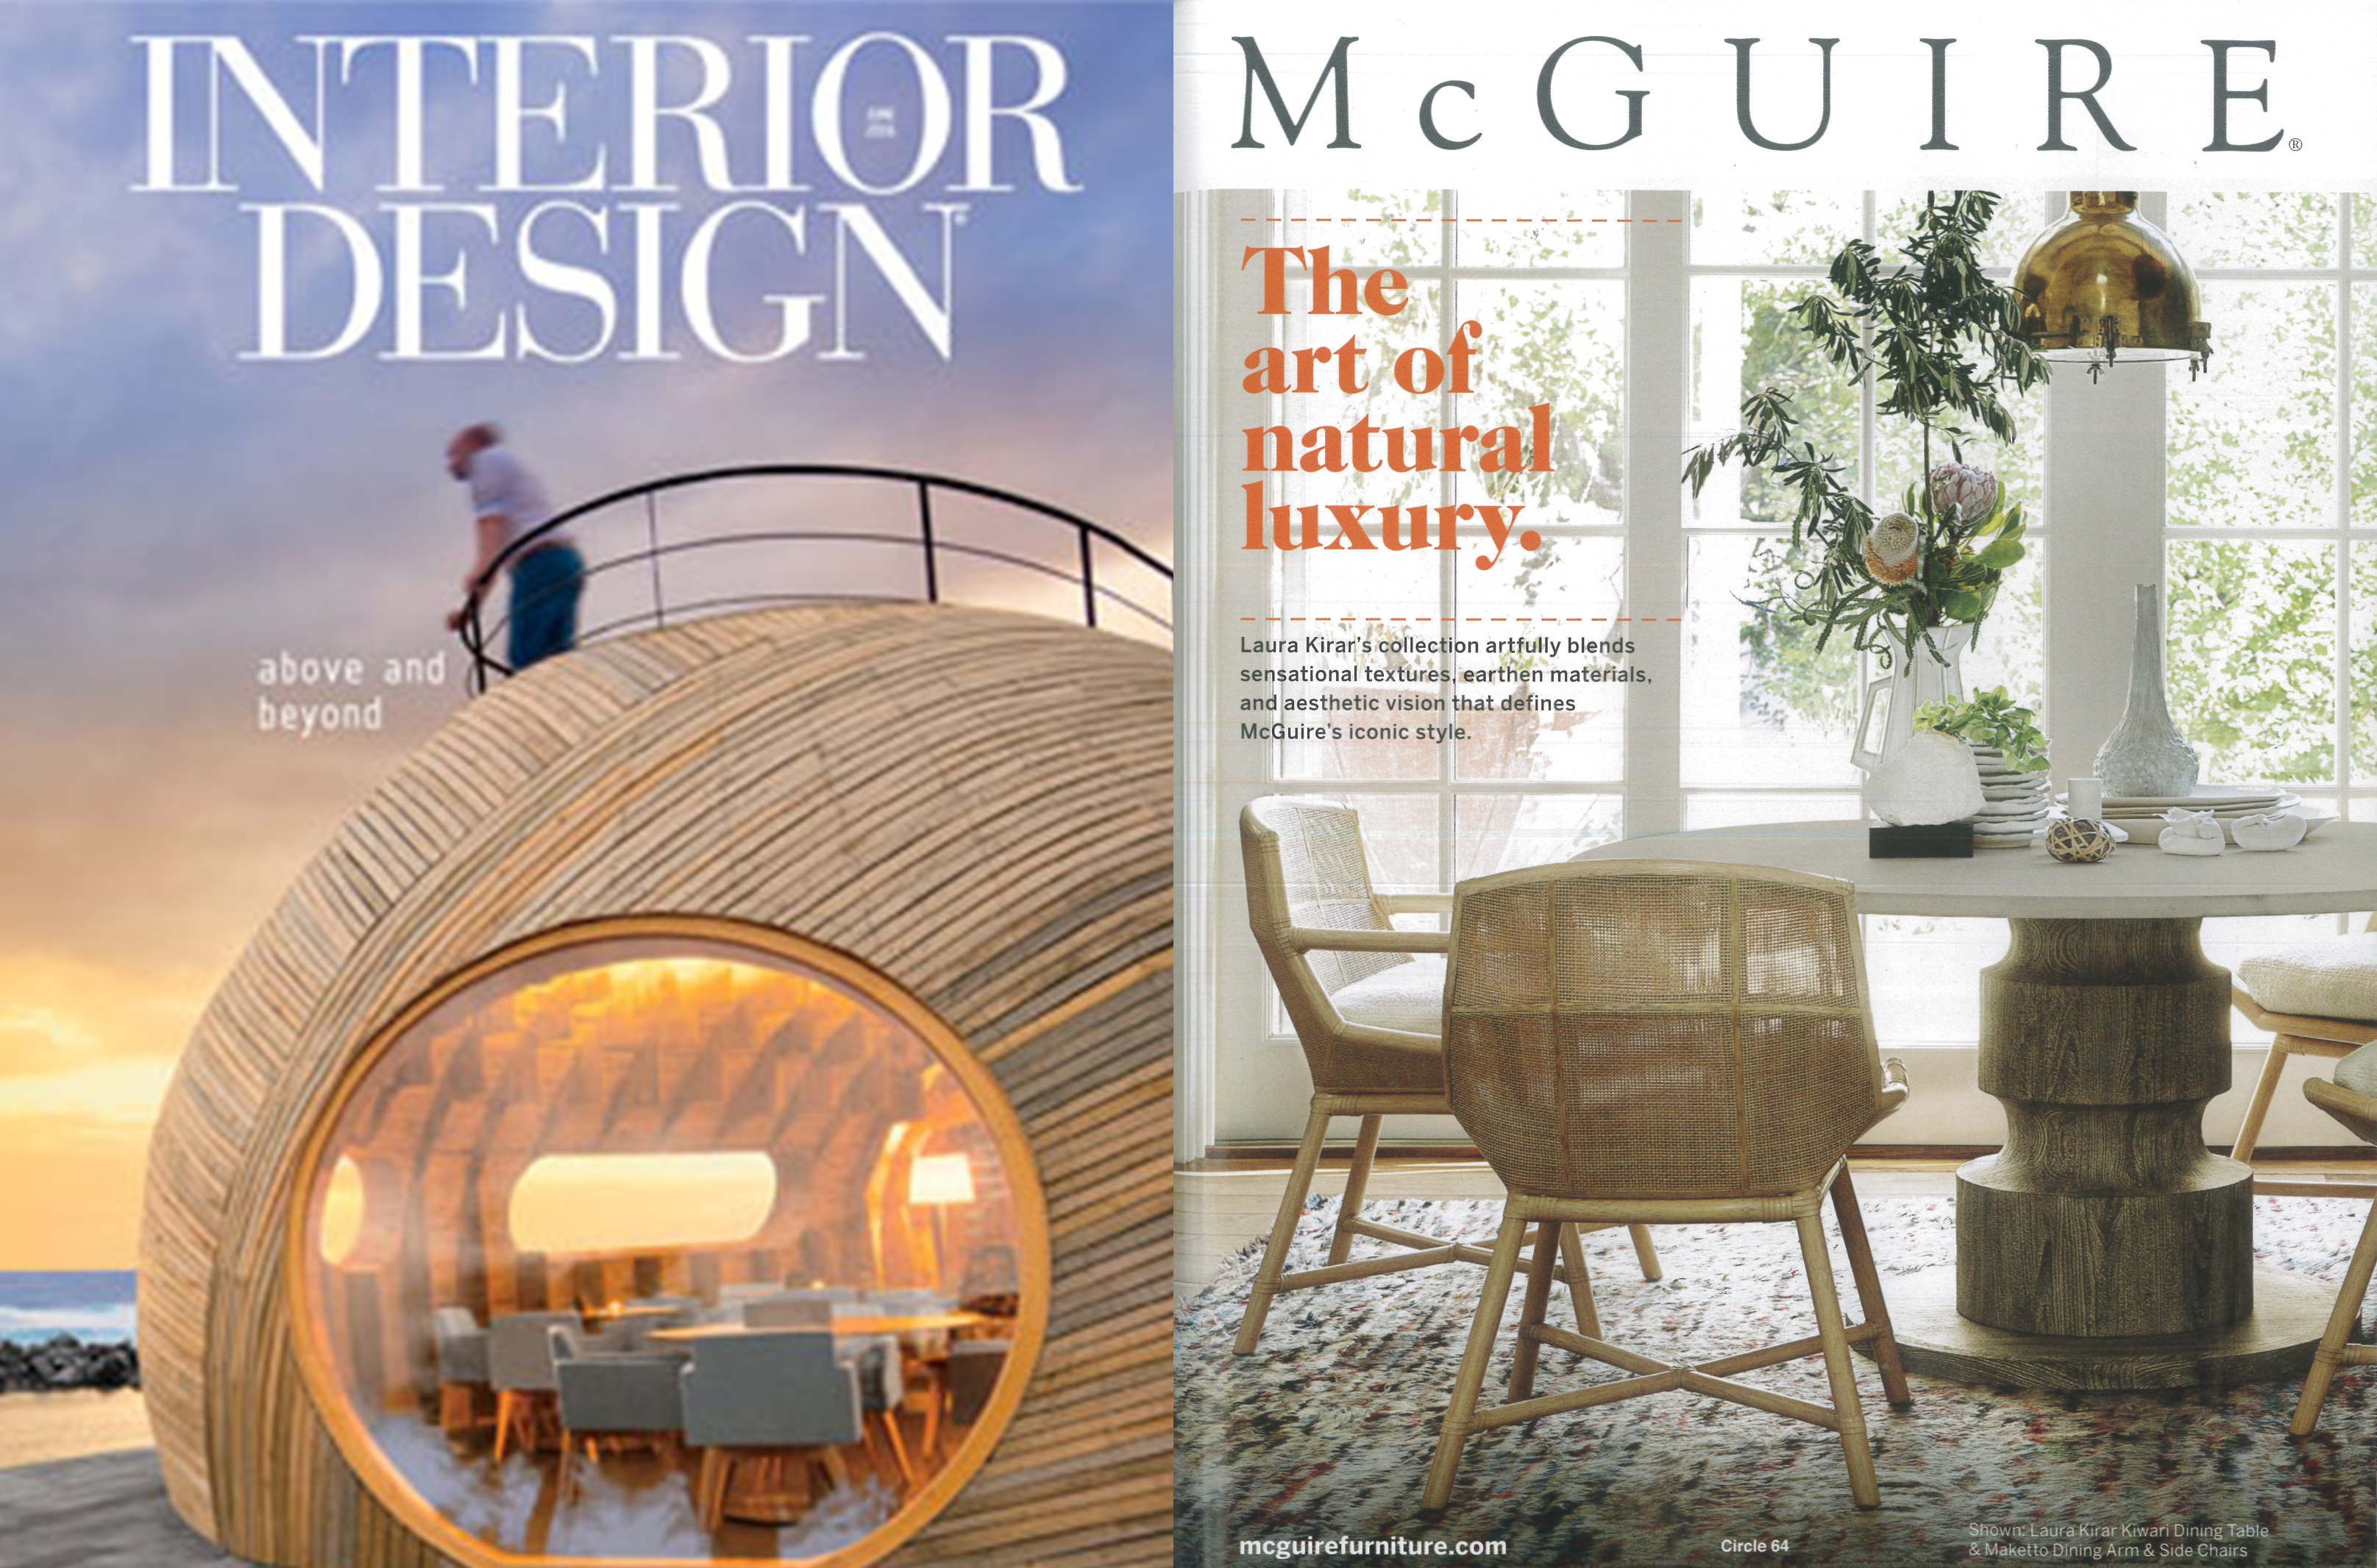 laura kirar, interior design, interior design magazine, mcguire, chairs, maketto, woven chairs, chic, stylish